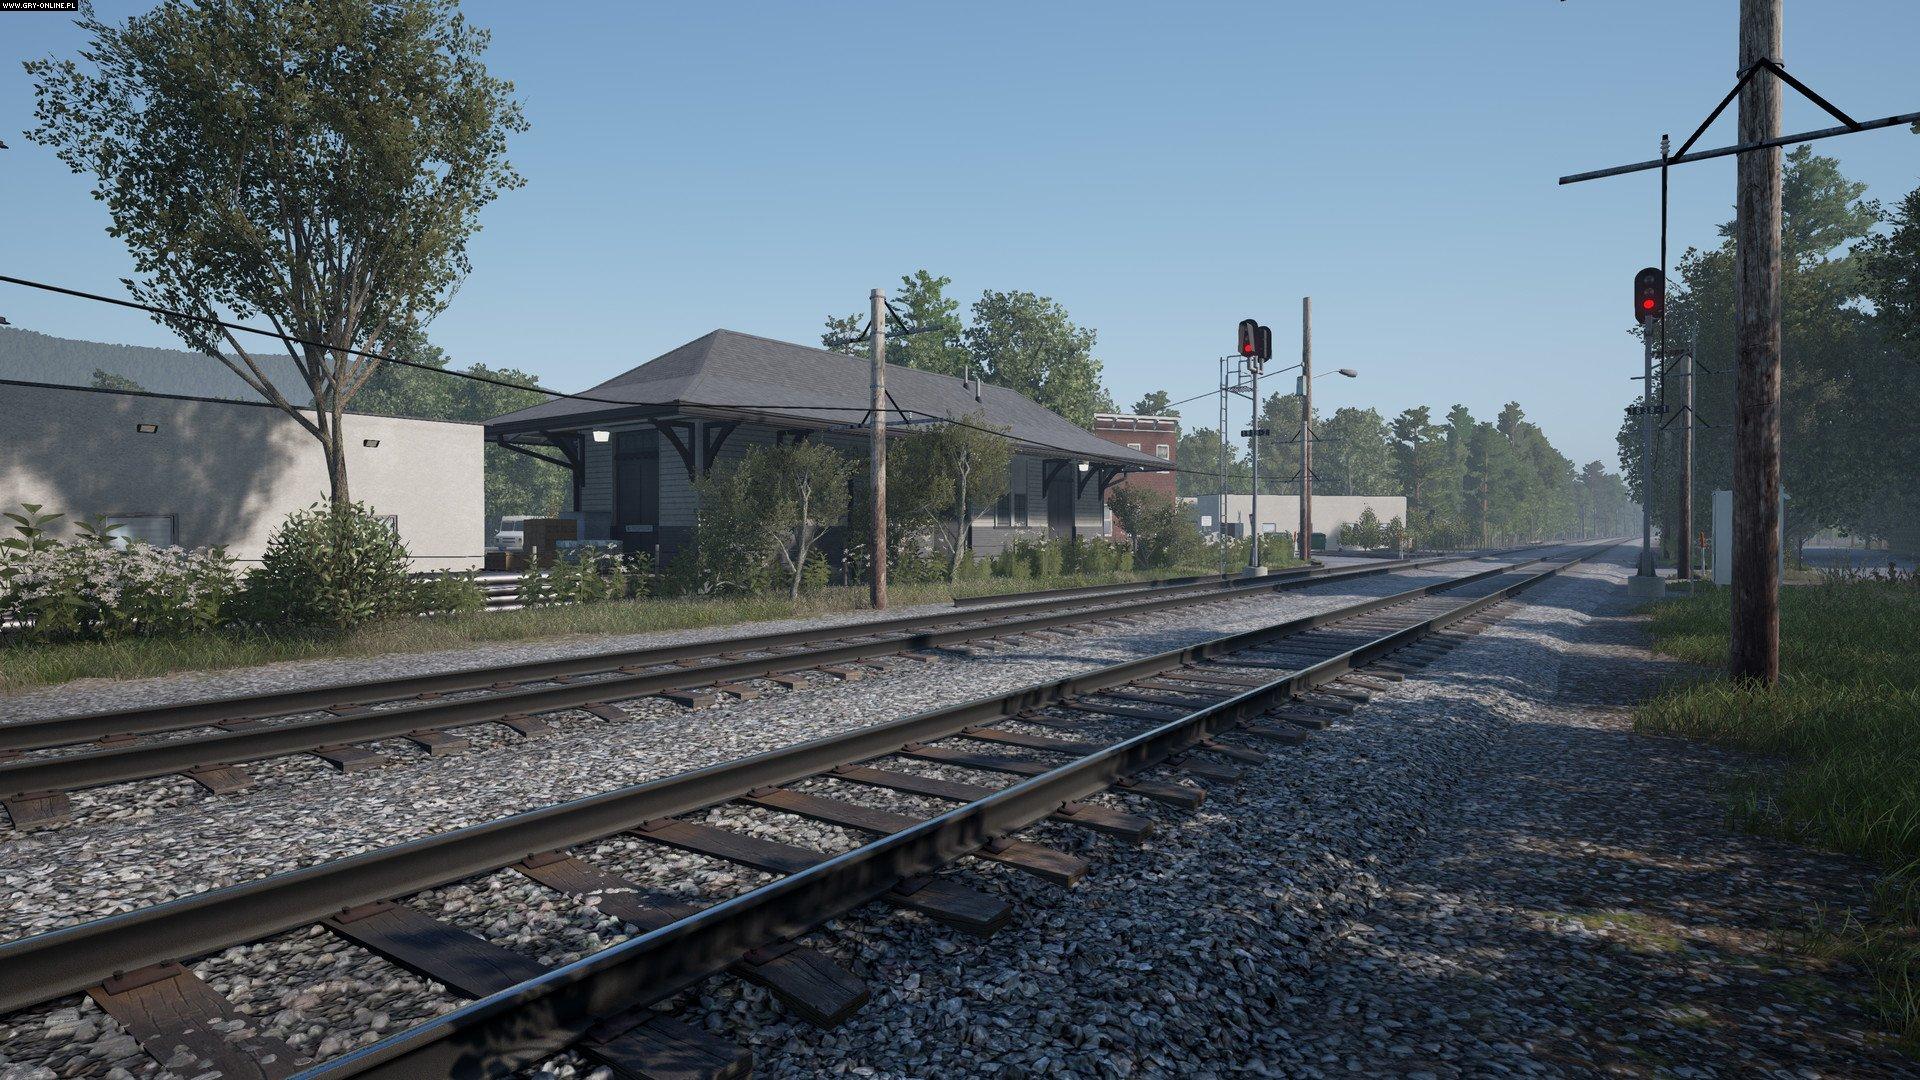 Train Sim World: CSX Heavy Haul PC, XONE Games Image 4/8, Dovetail Games/Rail Simulator Developments